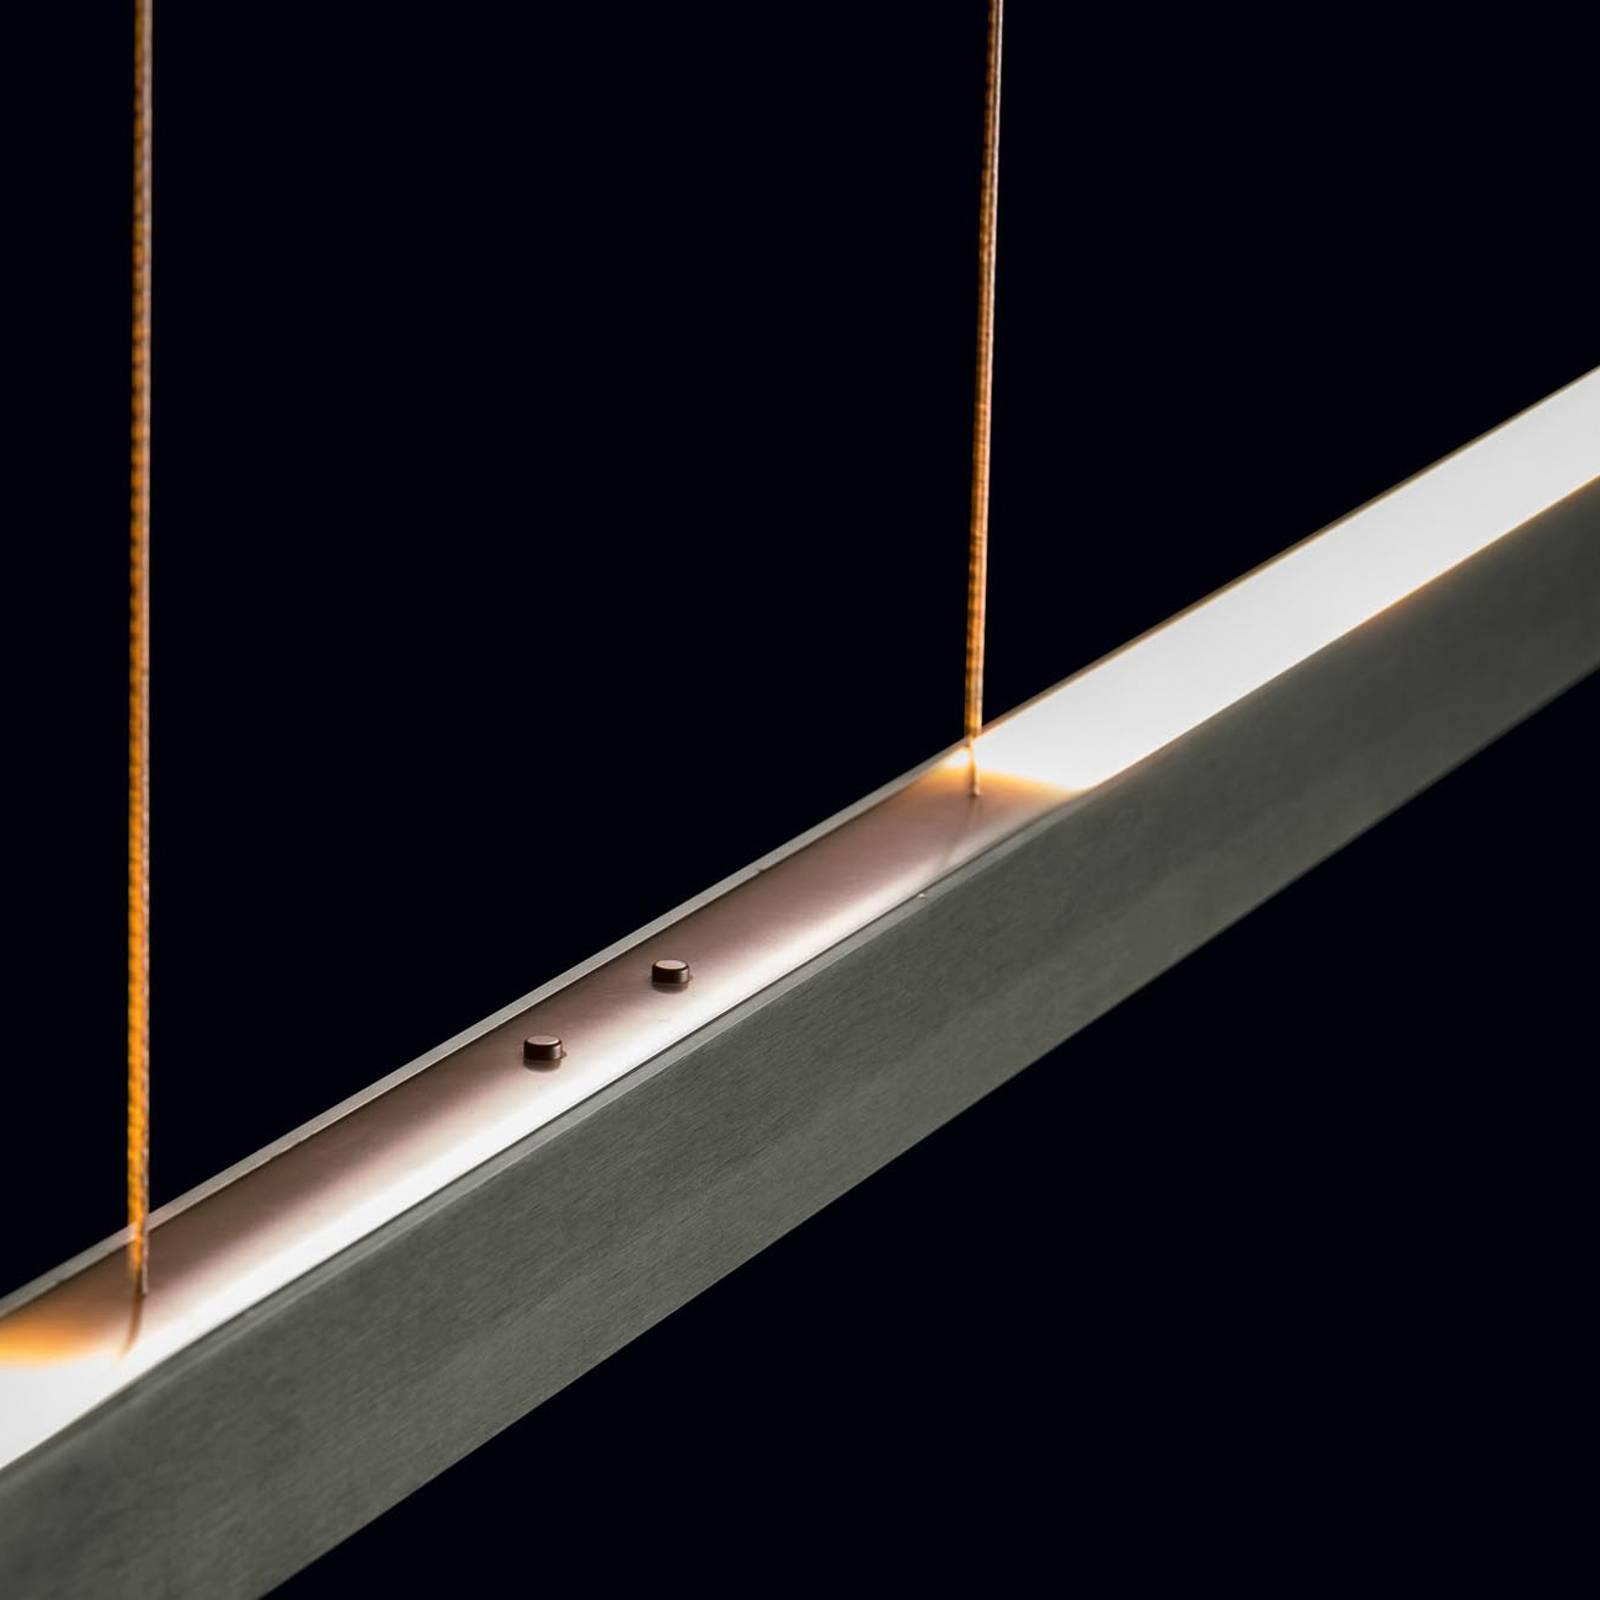 Holtkötter Xena S LED-Hängeleuchte, 120 cm, platin